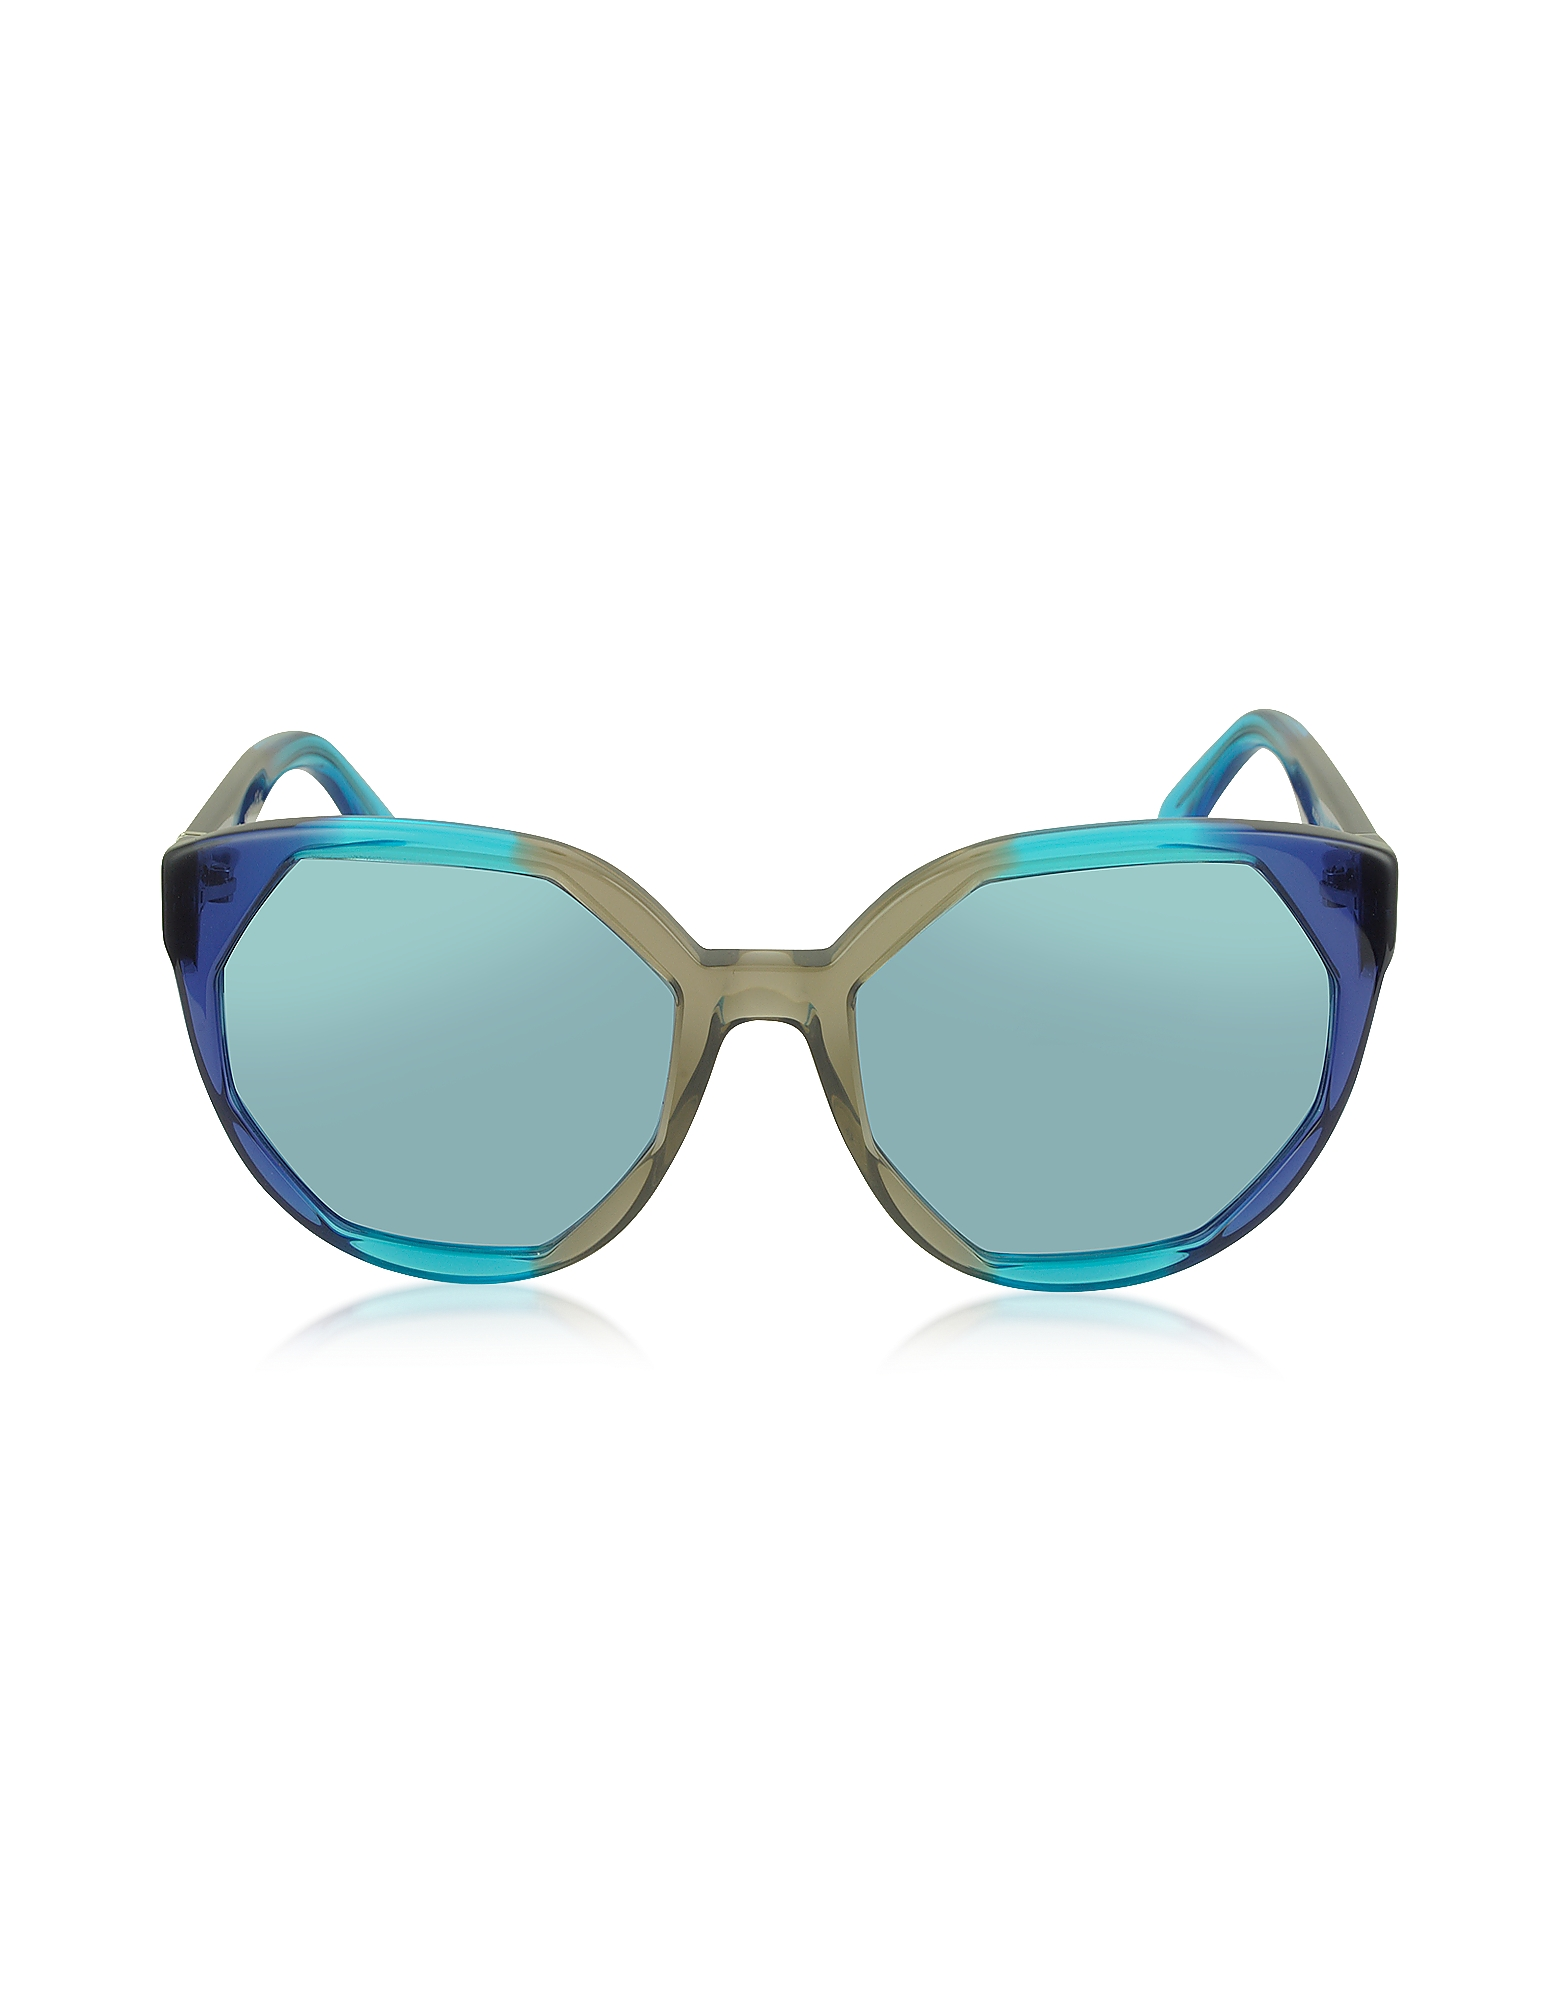 Marc Jacobs Designer Sunglasses, MJ 585/S Oversized Round Sunglasses